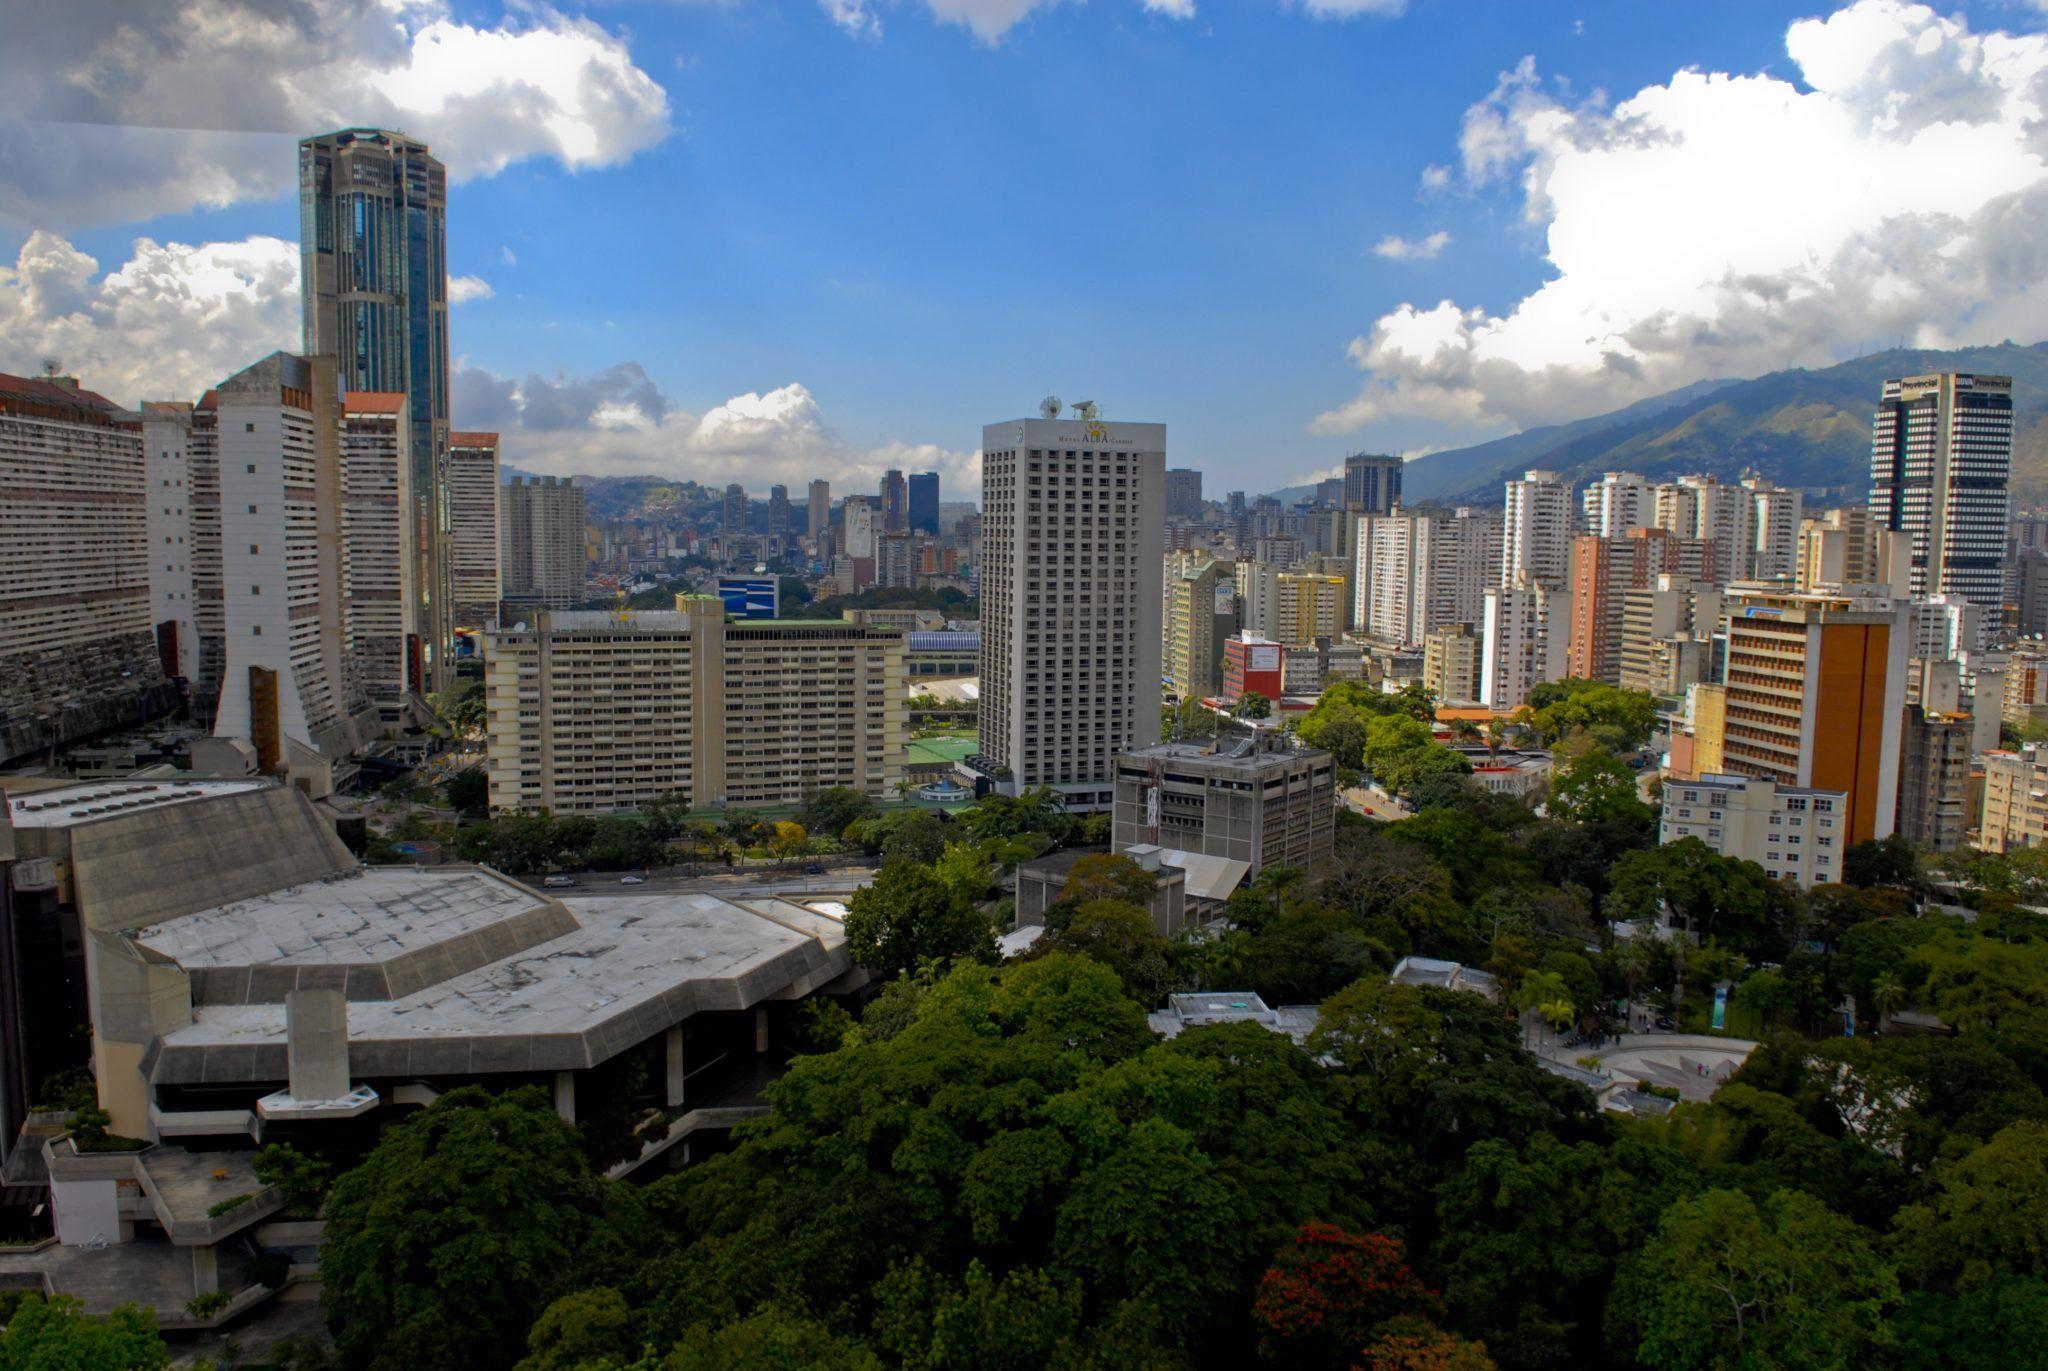 Caracas, Venezeula